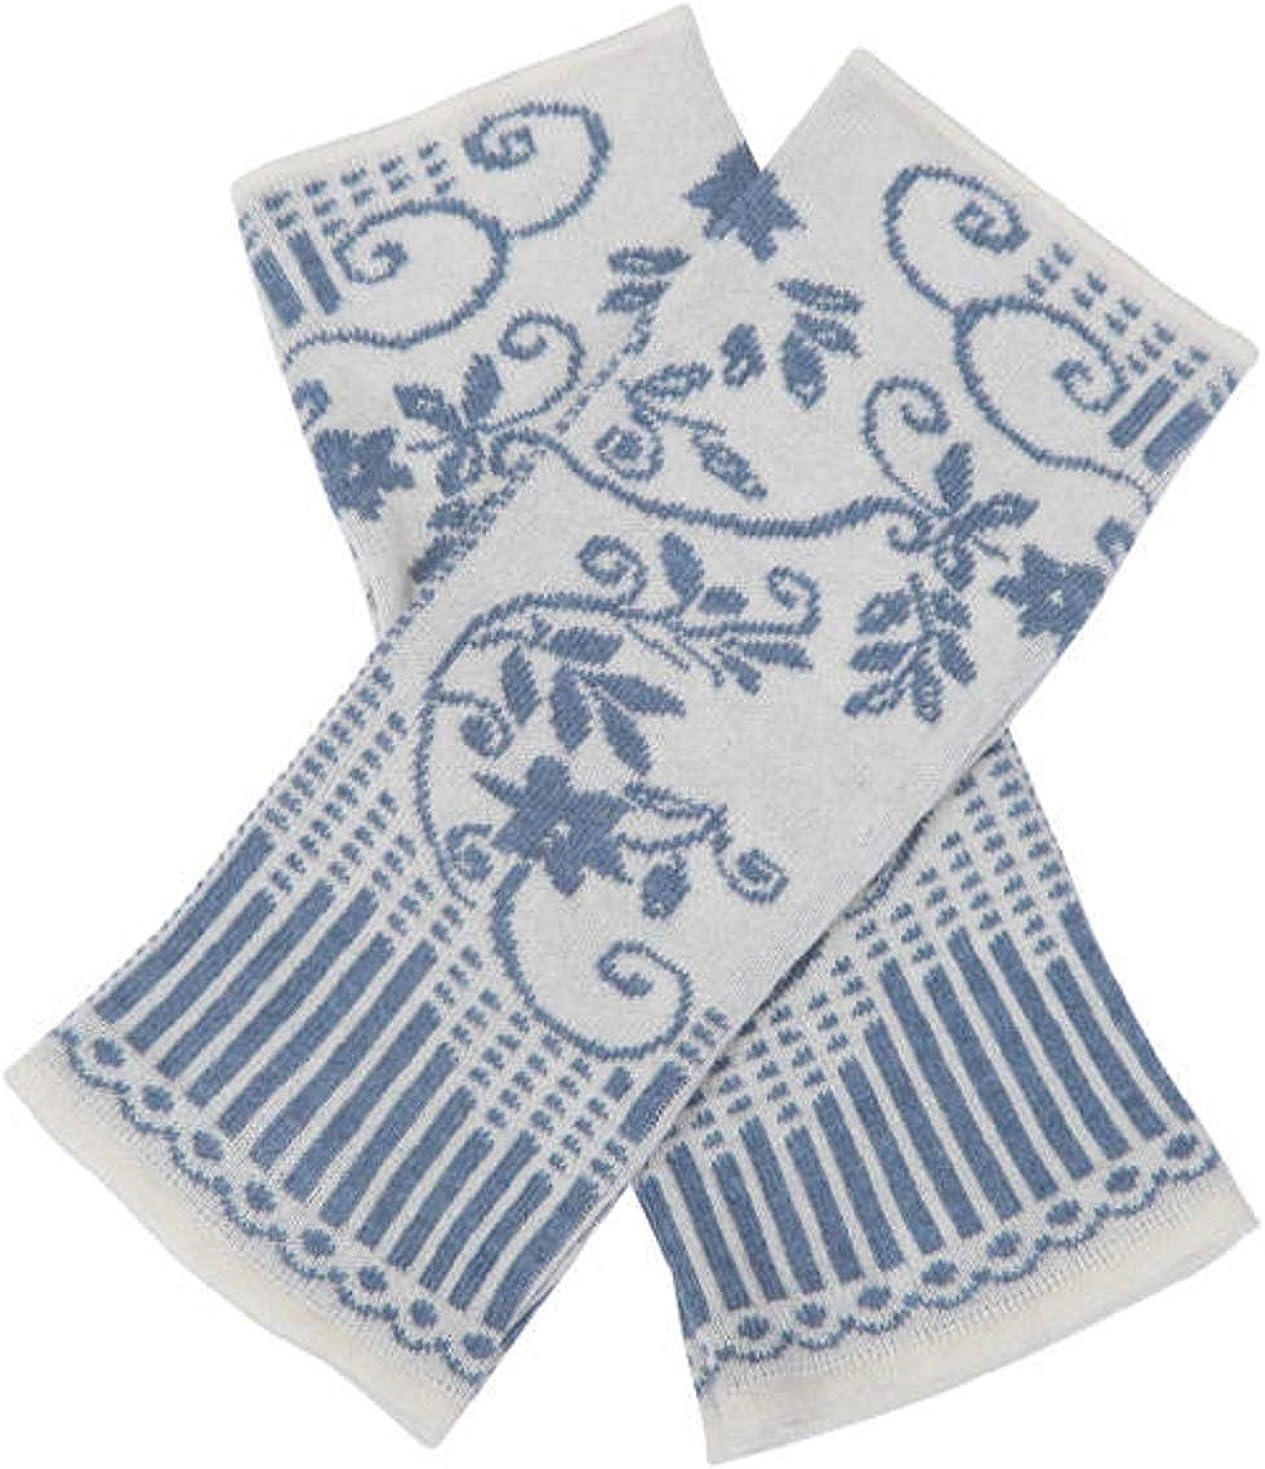 IVKO Jacquard Pullwarmers, Off White ǀ Viscose Cotton Arm Warmers Fingerless Gloves Thumbhole Mittens